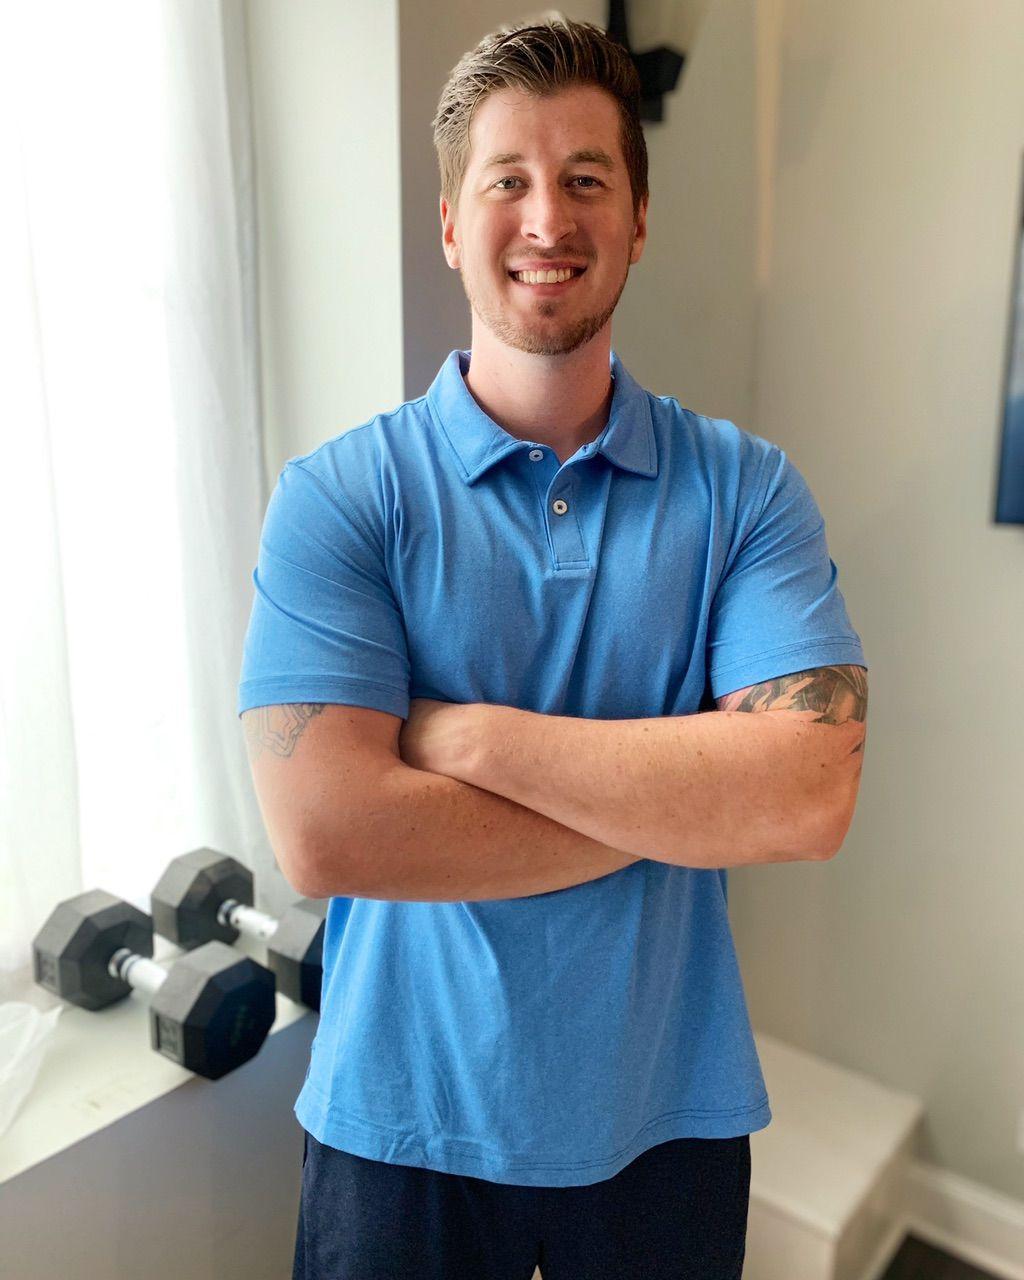 Mercer Exercise Physiology LLC